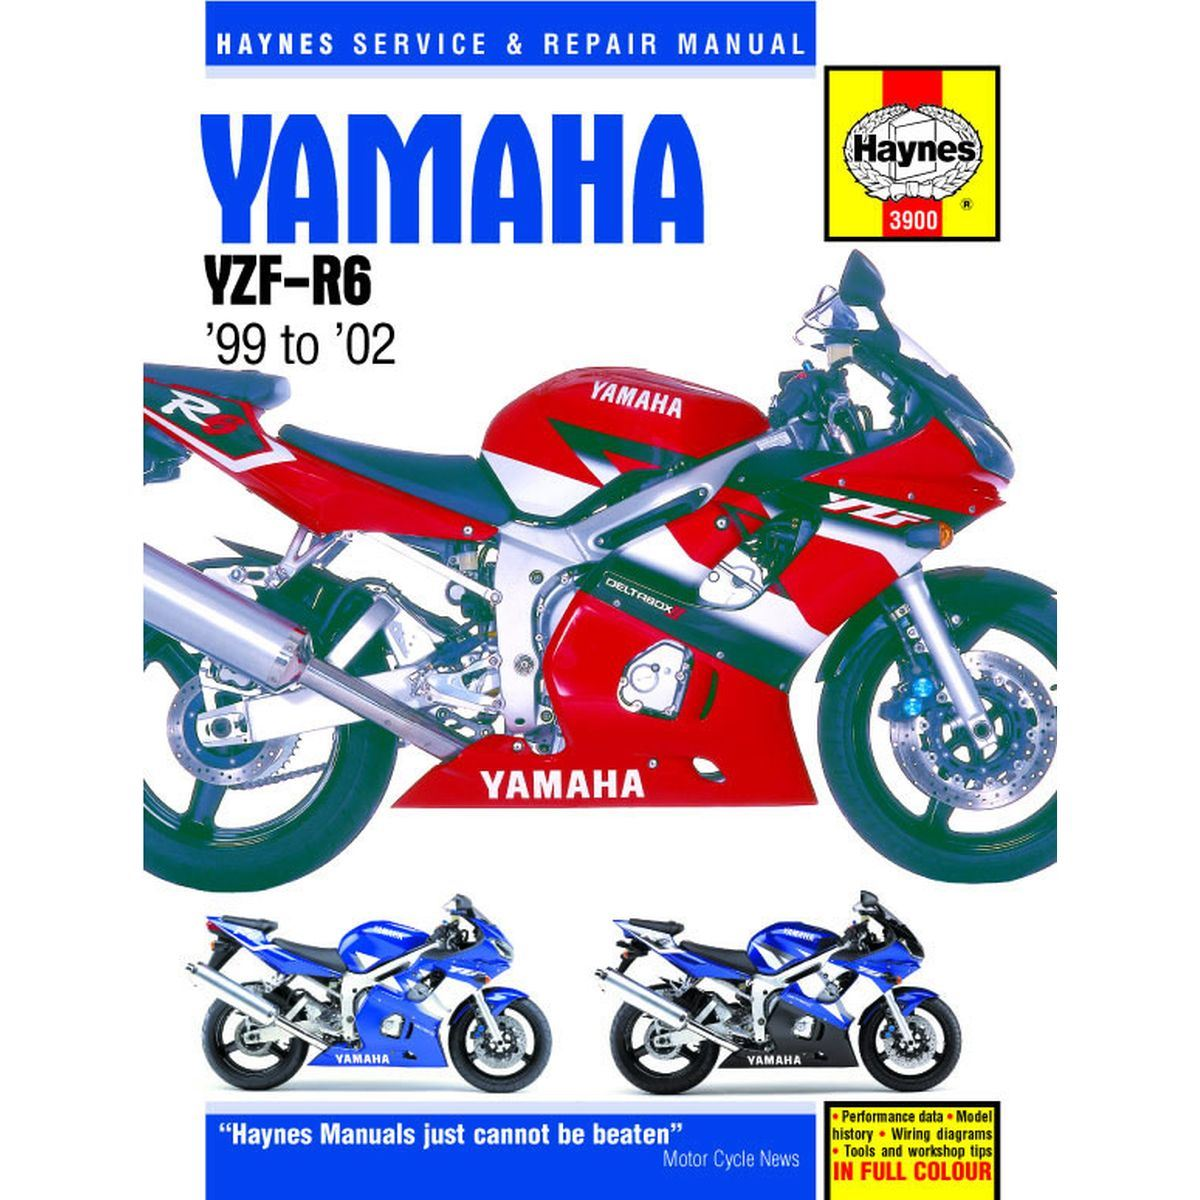 PDF-9423] 2000 Yamaha R6 Repair Manuals | 2019 Ebook Liry on yamaha r6 ignition switch, yamaha r6 clutch, yamaha r6 tires, yamaha r6 ecu, yamaha r6 suspension, yamaha r6 wheels, yamaha r6 forum, yamaha r6 battery, suzuki c50 wiring diagram, yamaha r6 motor, yamaha r6 frame, yamaha r6 chain adjustment, yamaha r6 schematics, yamaha r6 brakes, yamaha r6 engine, yamaha r6 coil, yamaha r6 lighting, yamaha r6 water pump, yamaha r6 power, yamaha r6 cover,